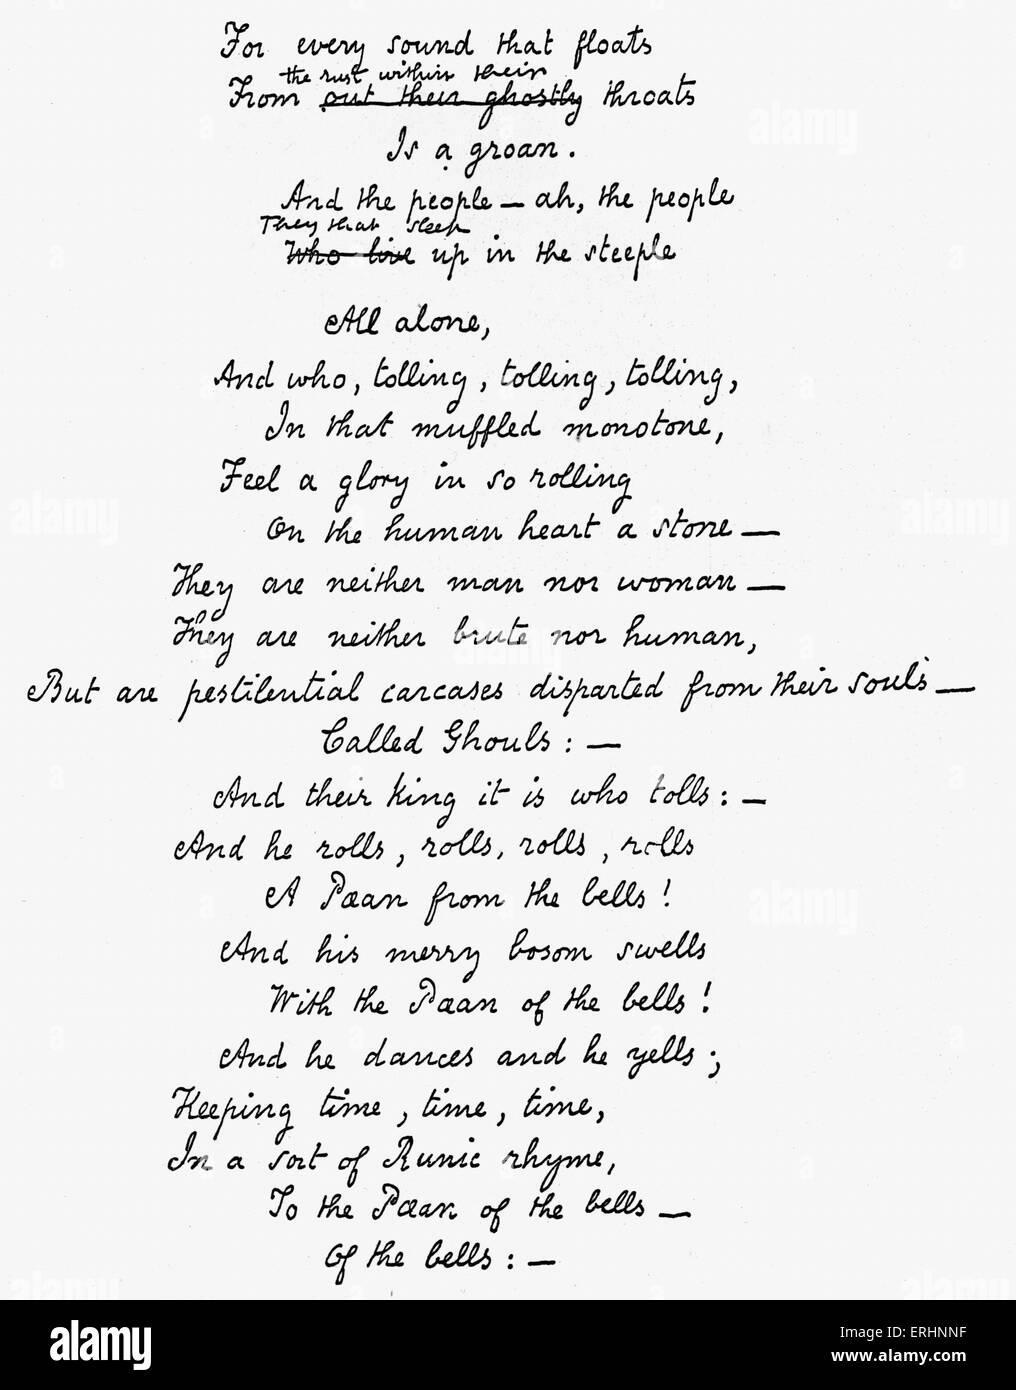 The Bells' - Edgar Allan Poe's handwritten manuscript of the last ...